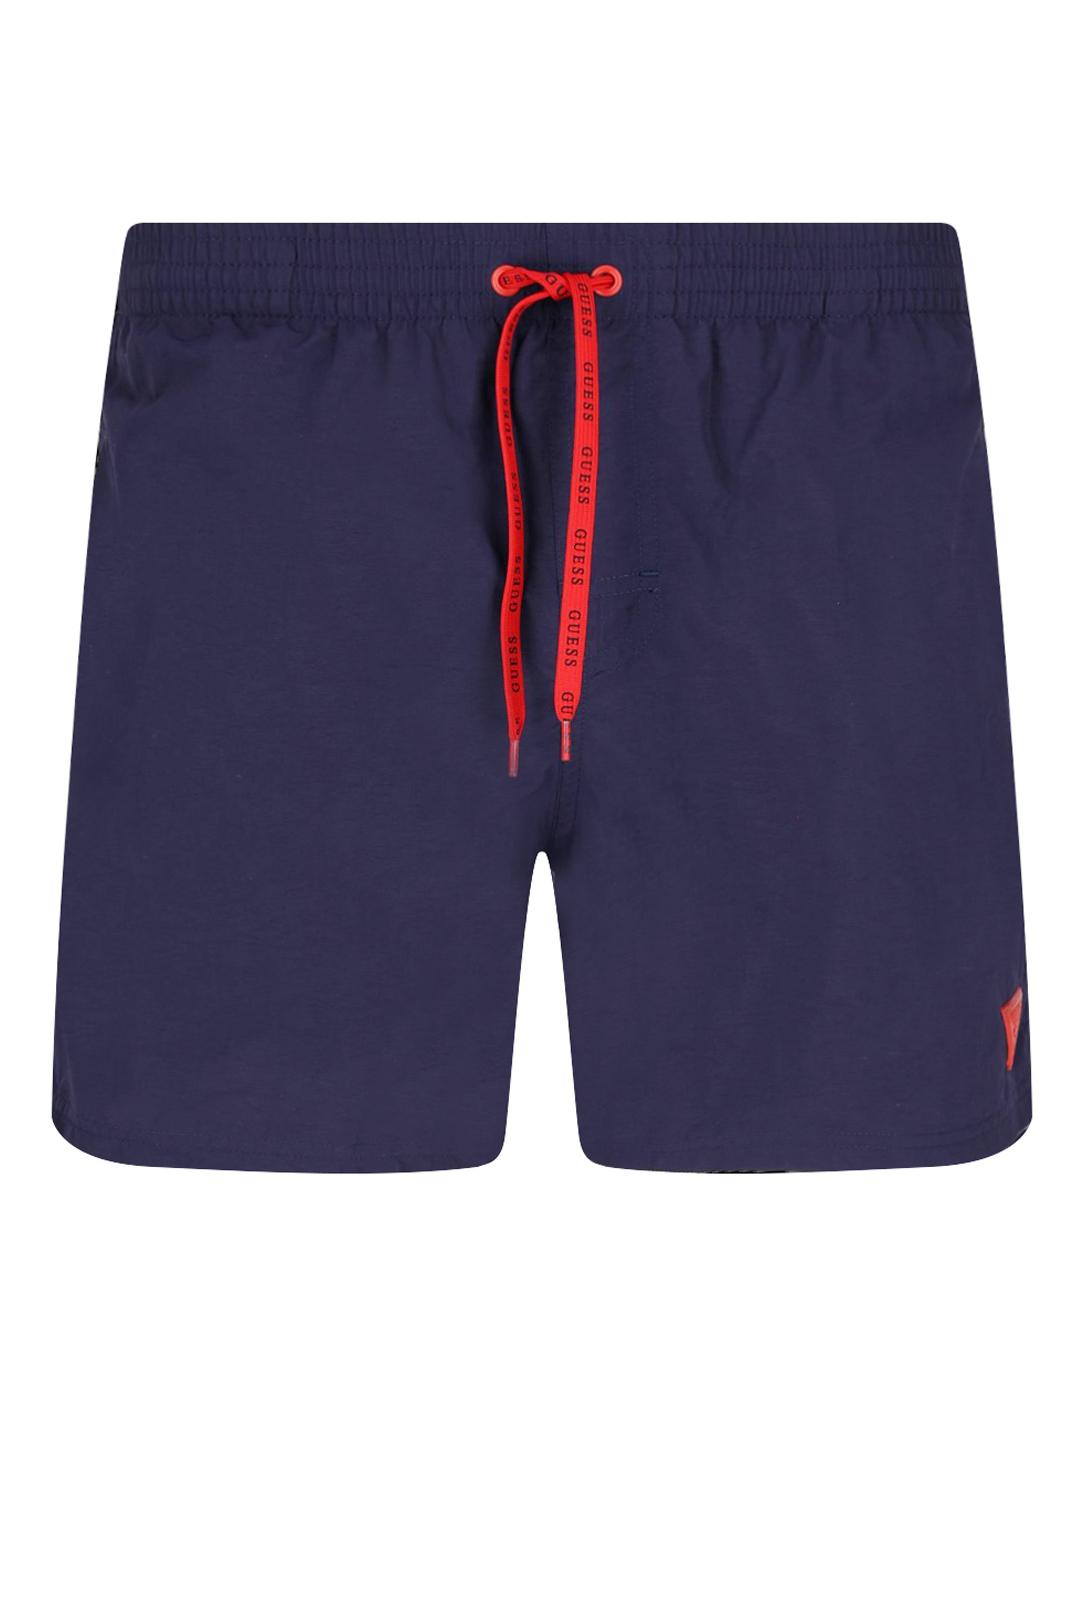 Shorts de bain  Guess jeans F02T01 TEL27 NVY Marine/Navy